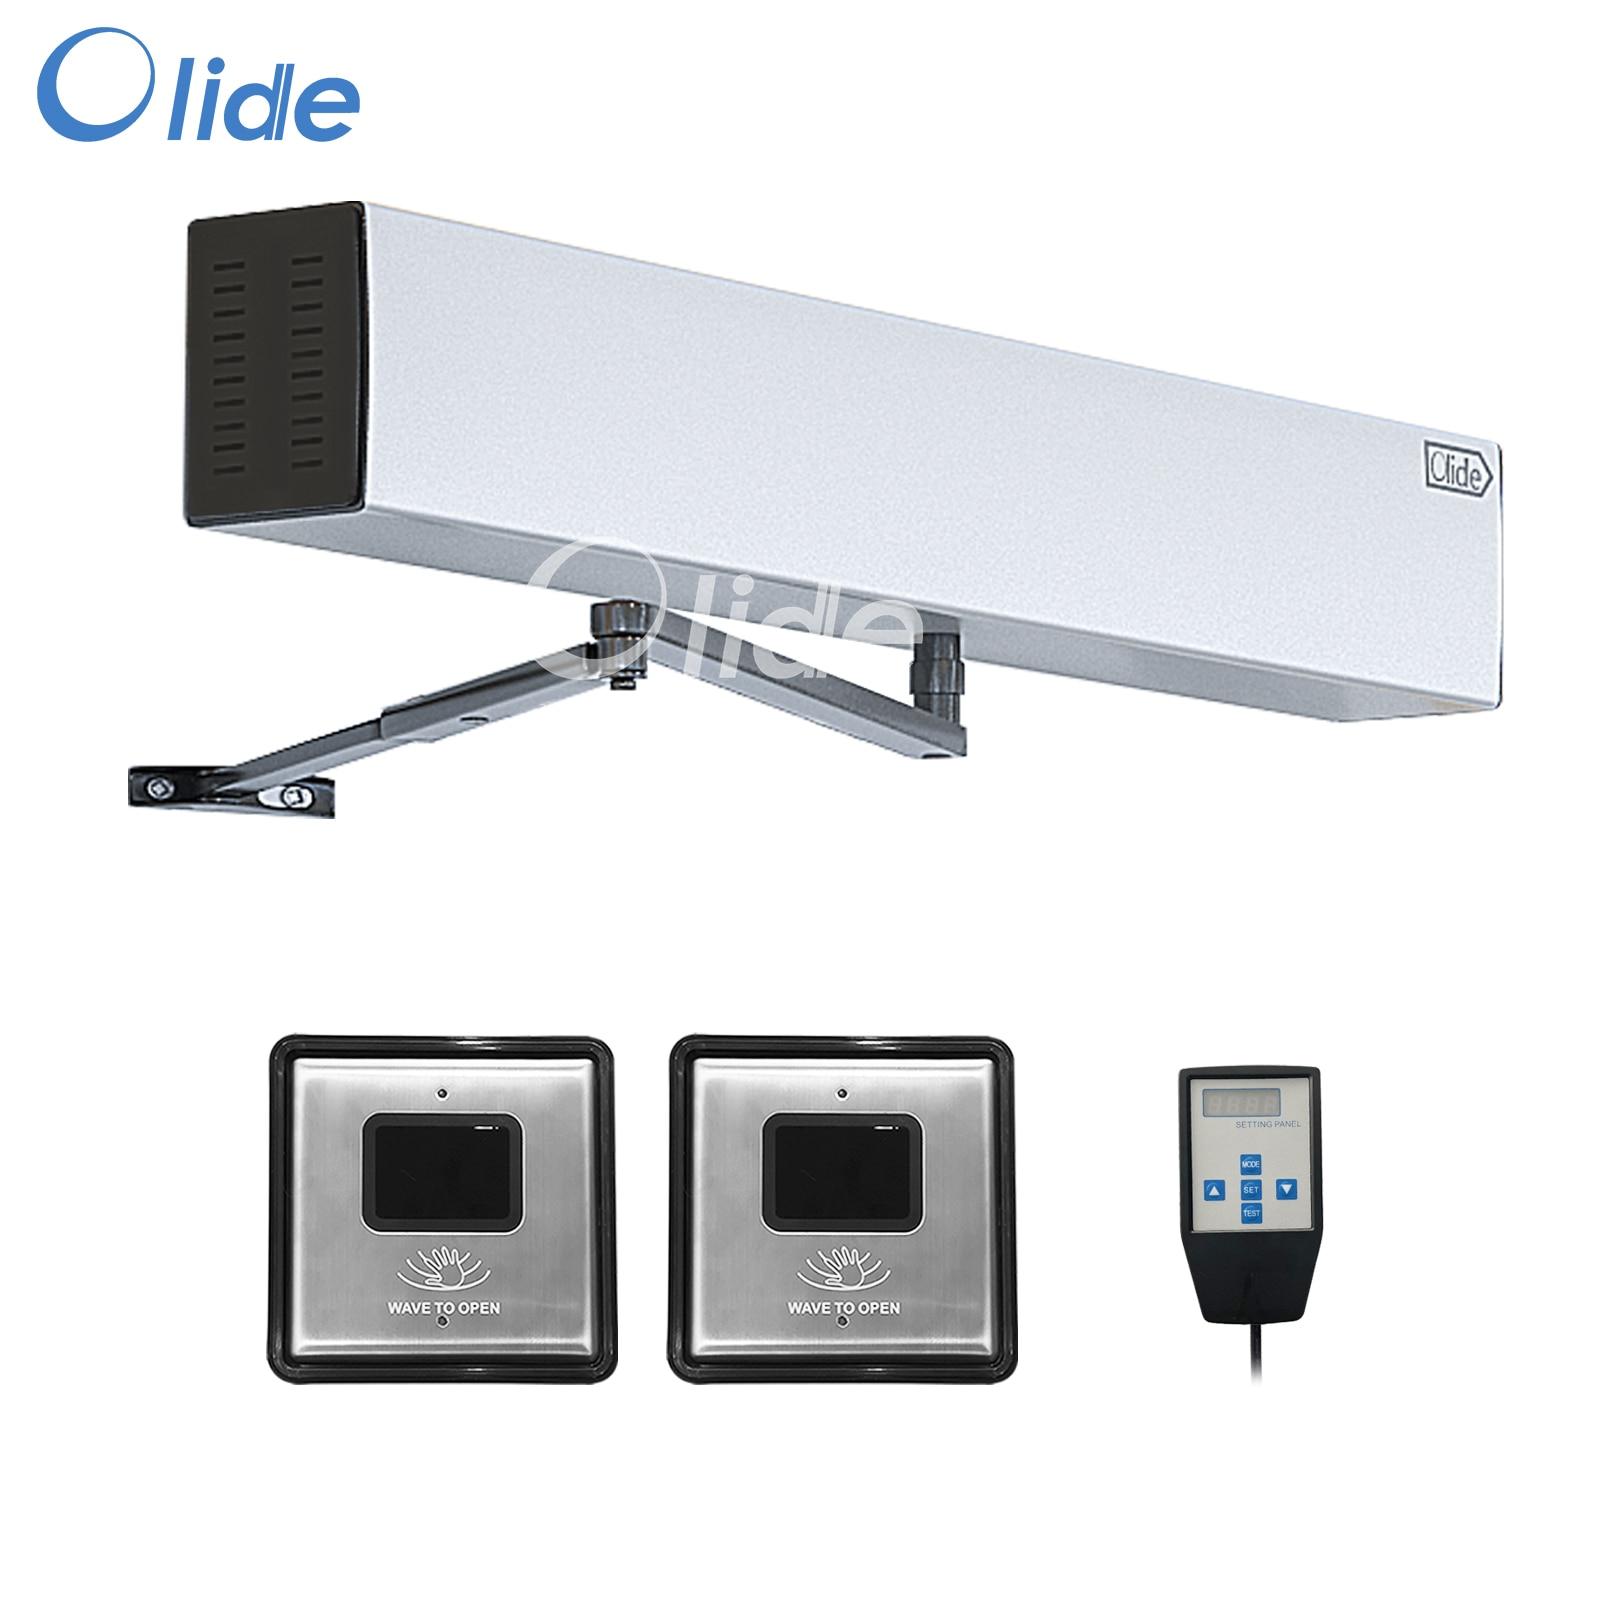 Olide Touchless استشعار مفتوحة التلقائي سوينغ الباب ، زوج مع 2 قطعة السلكية مربع Touchless موجة الاستشعار مفاتيح